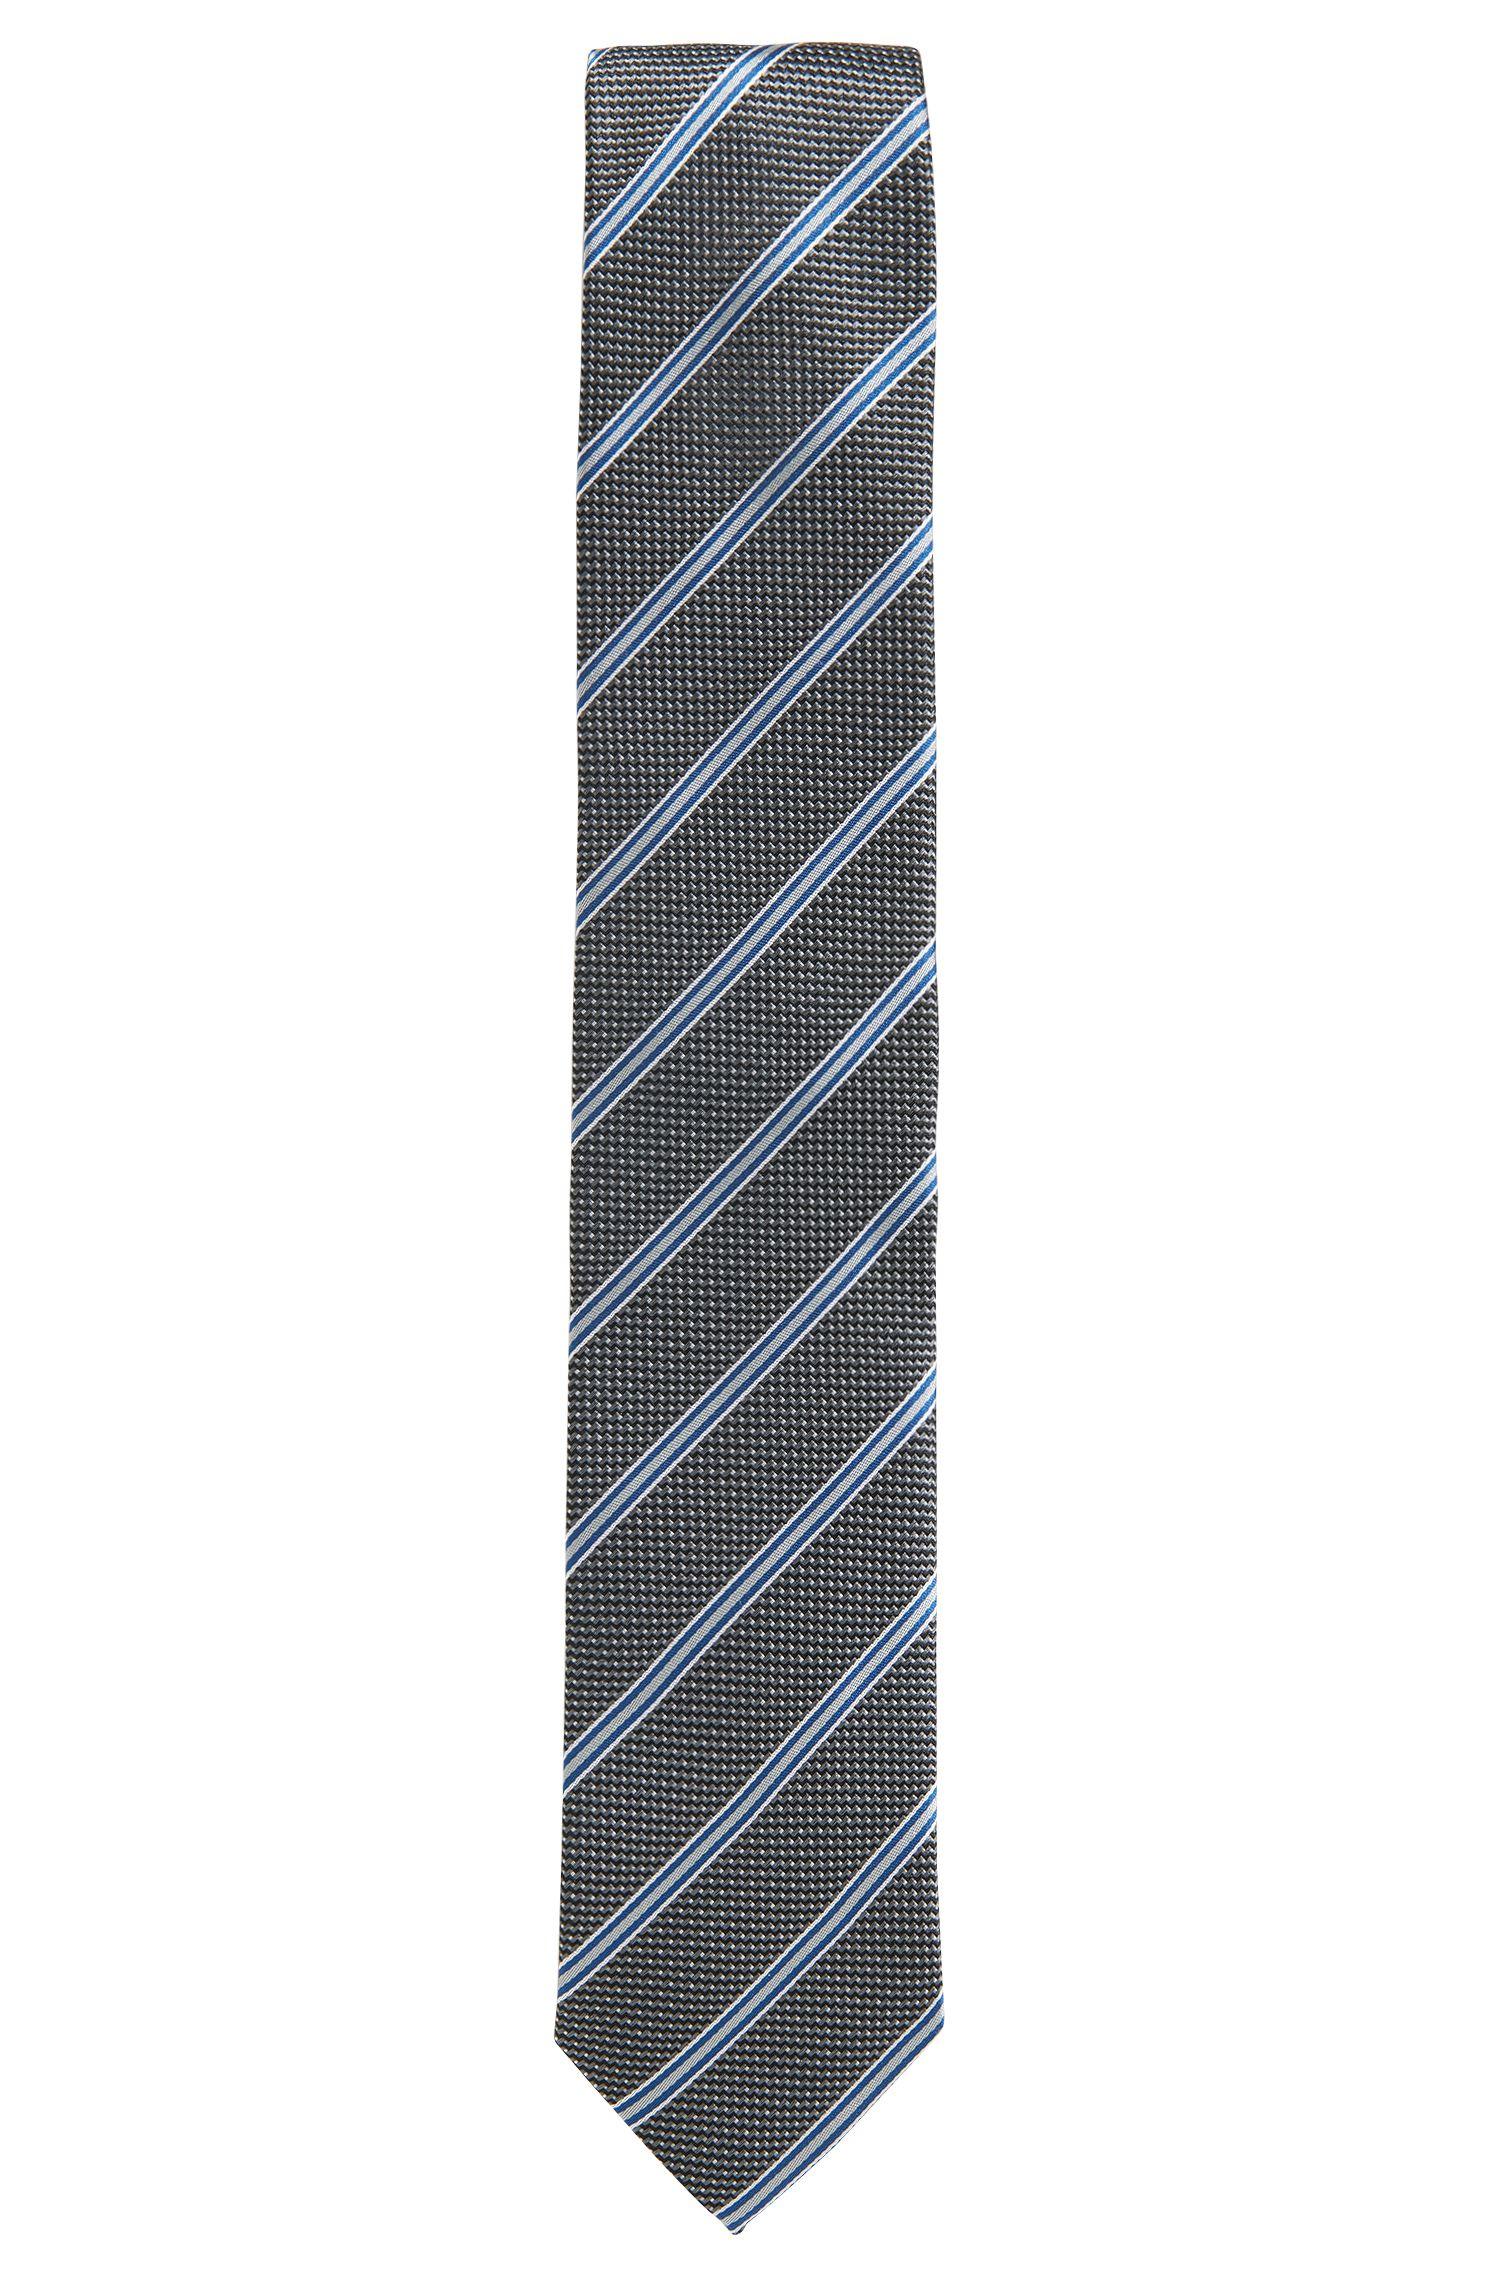 Gestreifte Krawatte aus gemustertem Seiden-Jacquard